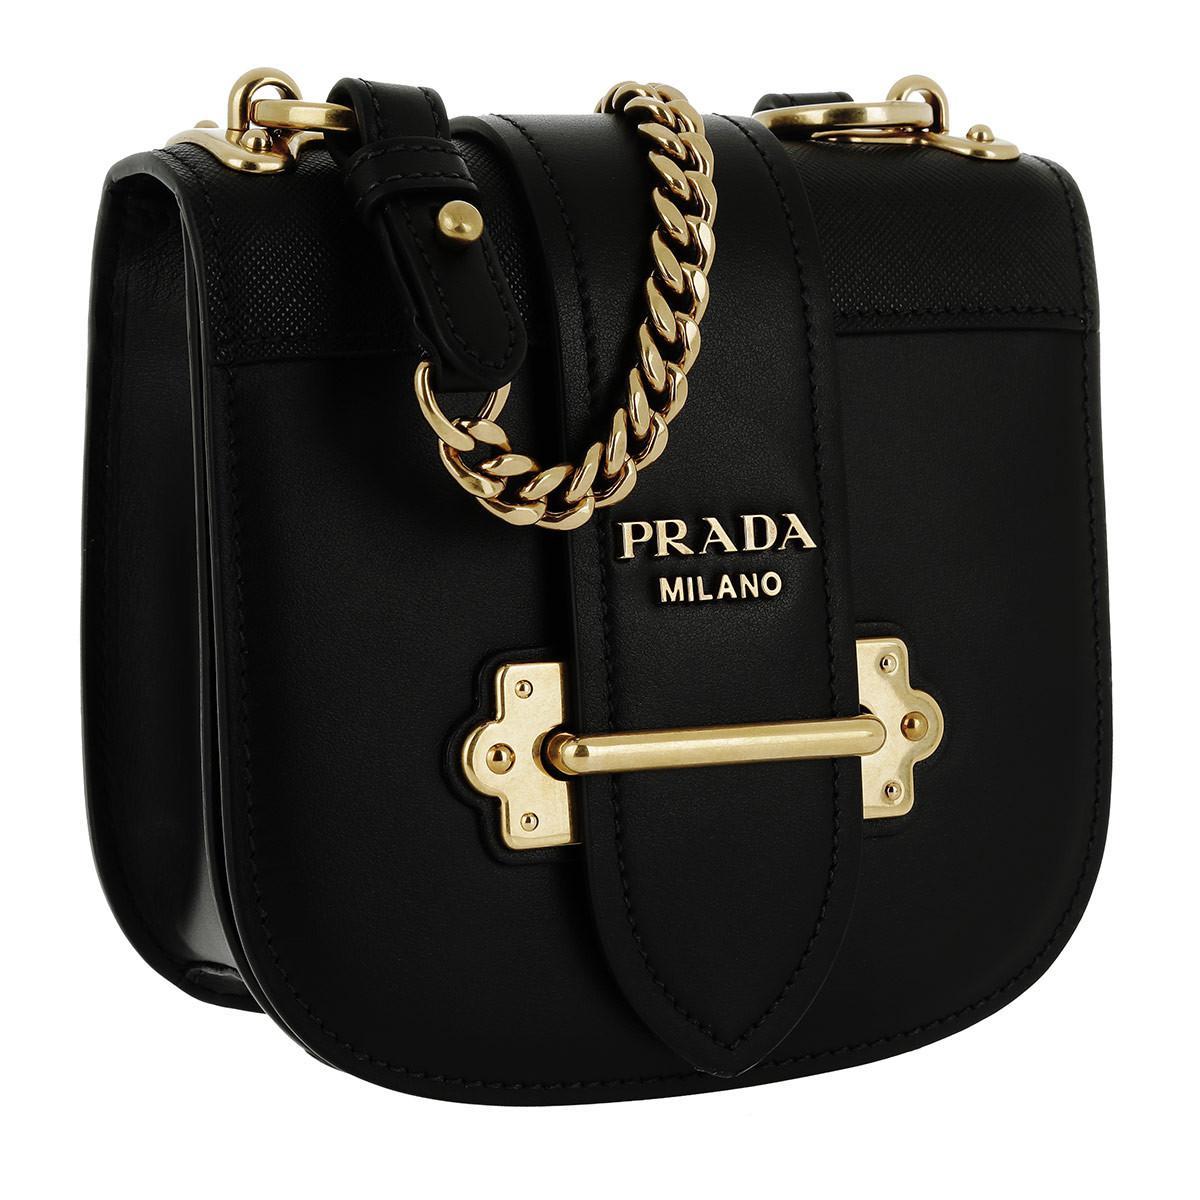 098139e747fd Prada Pionnière Bag Calf/saffiano Medium Nero in Black - Lyst